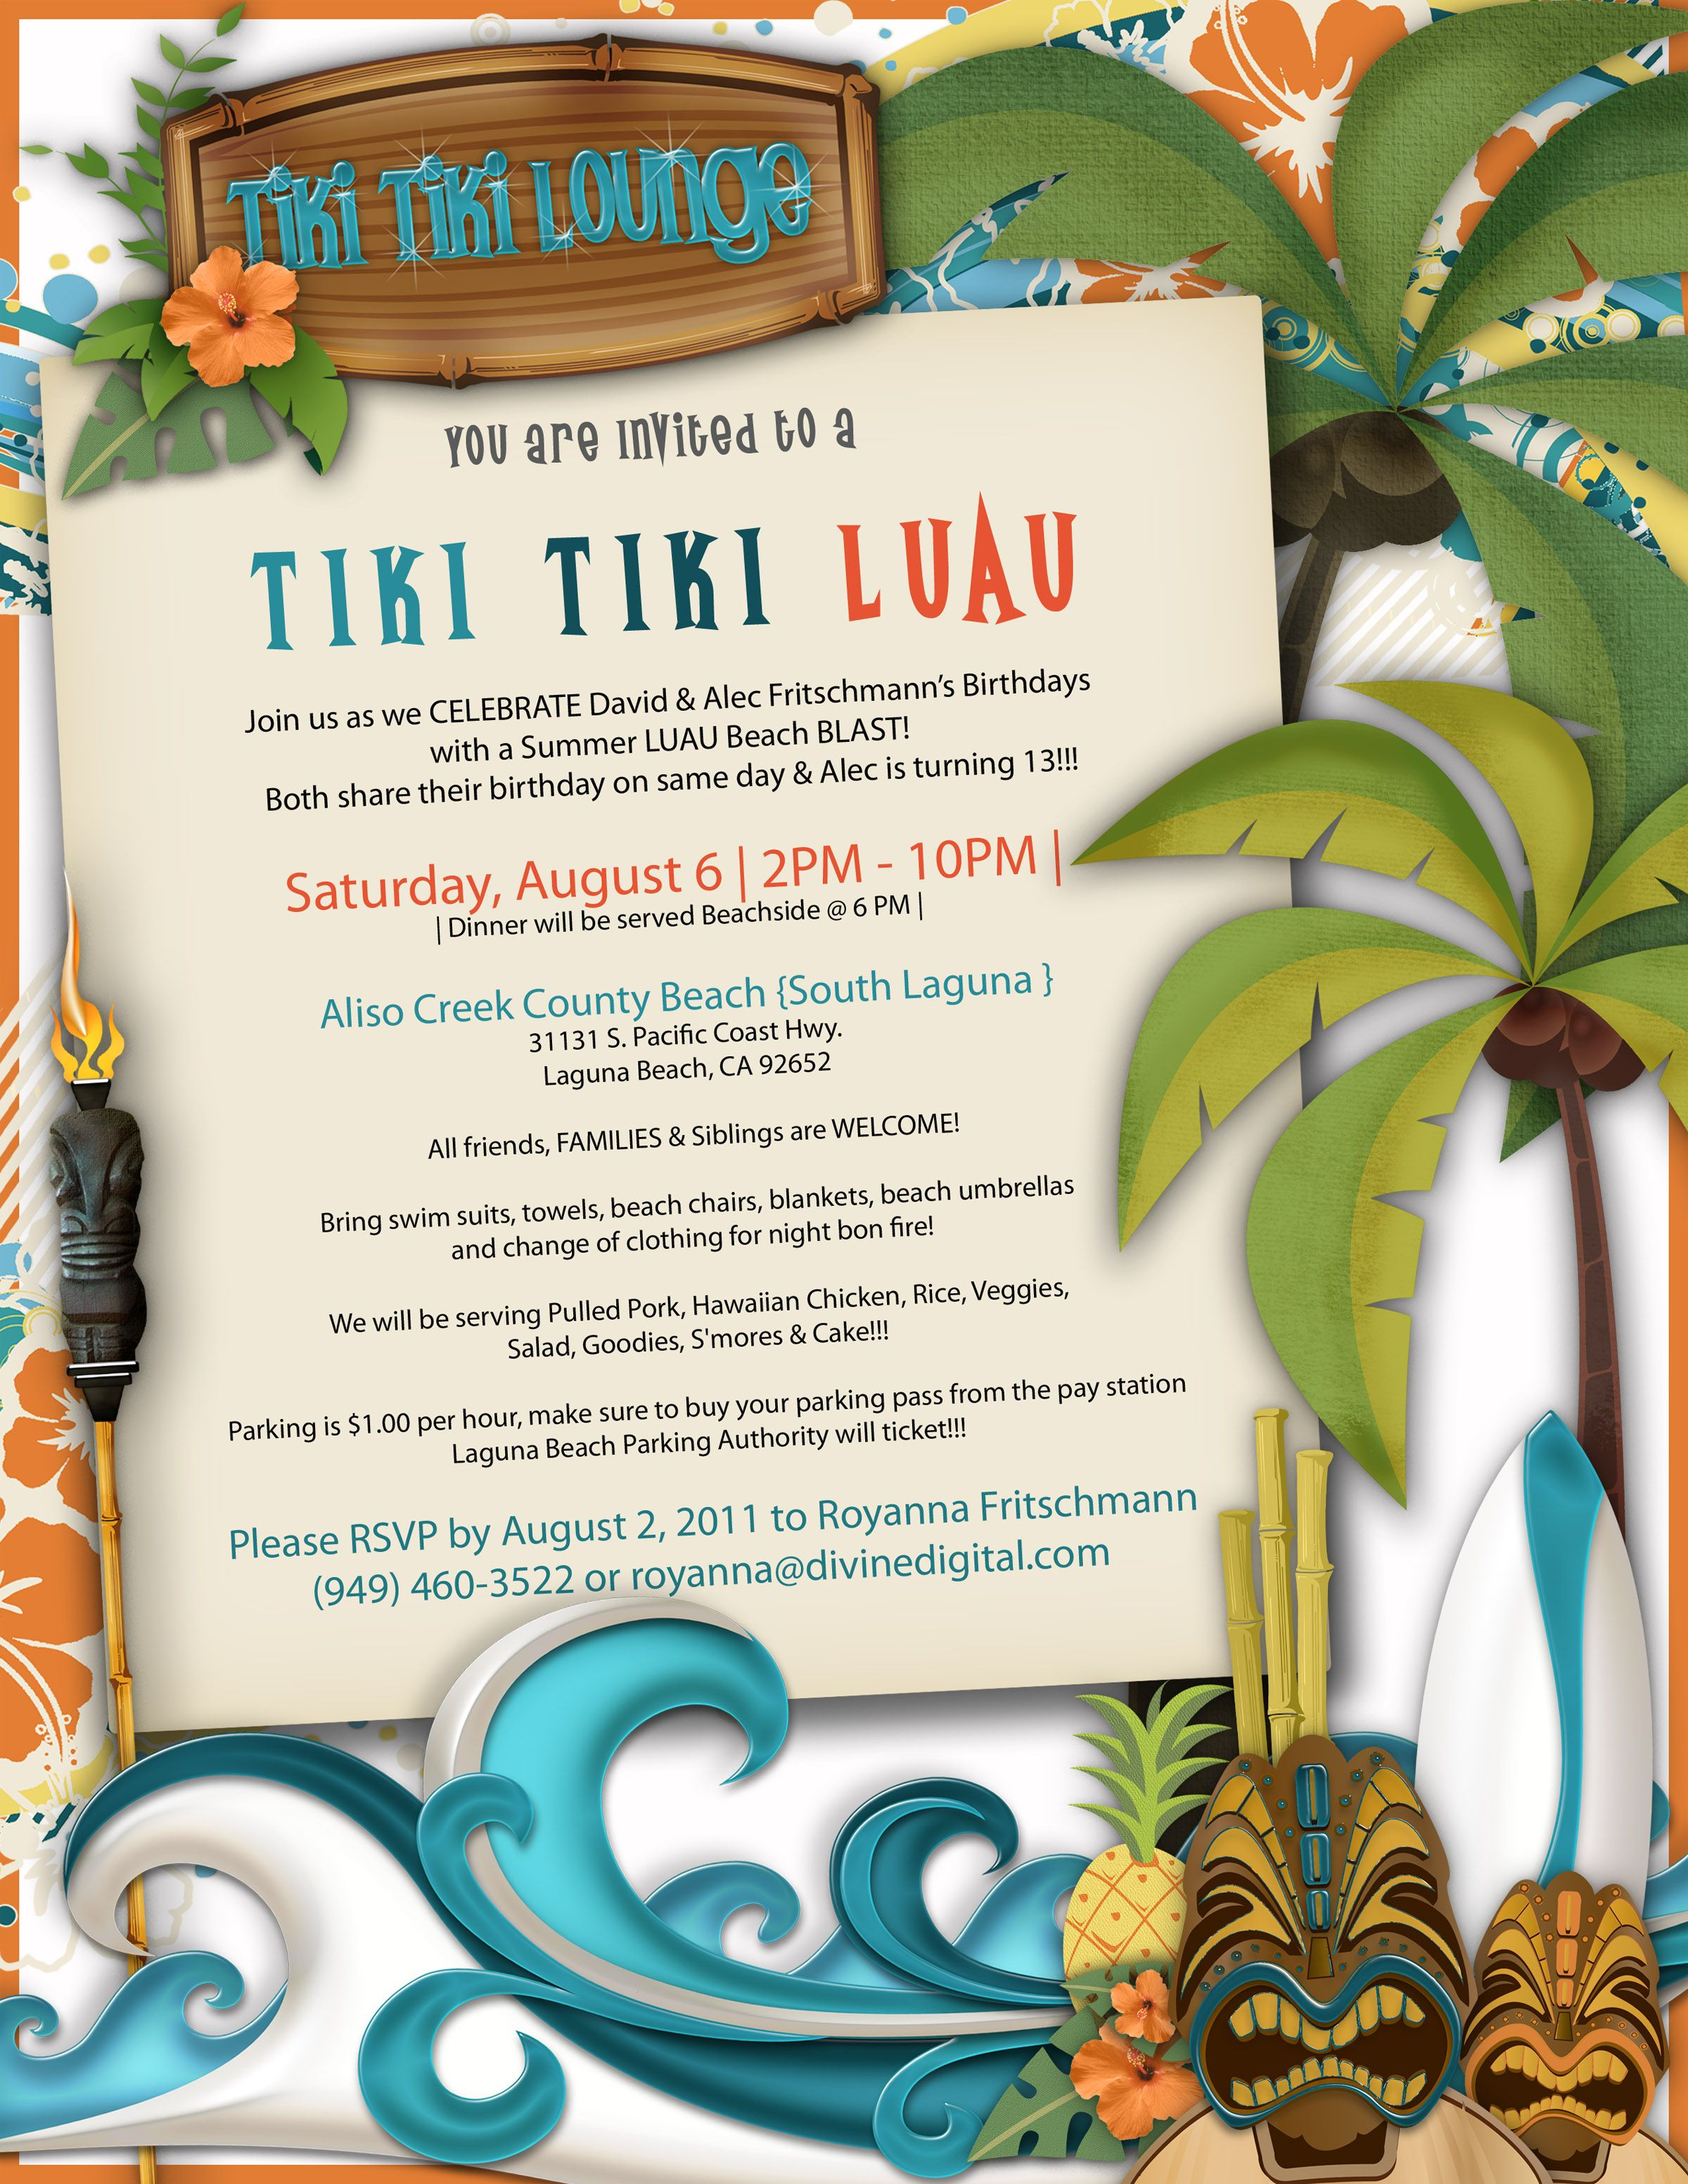 Scrapbook ideas hawaii - Birthday Invite By Royanna Fritschmann Using The Surf Hut Digital Scrapbook Kit